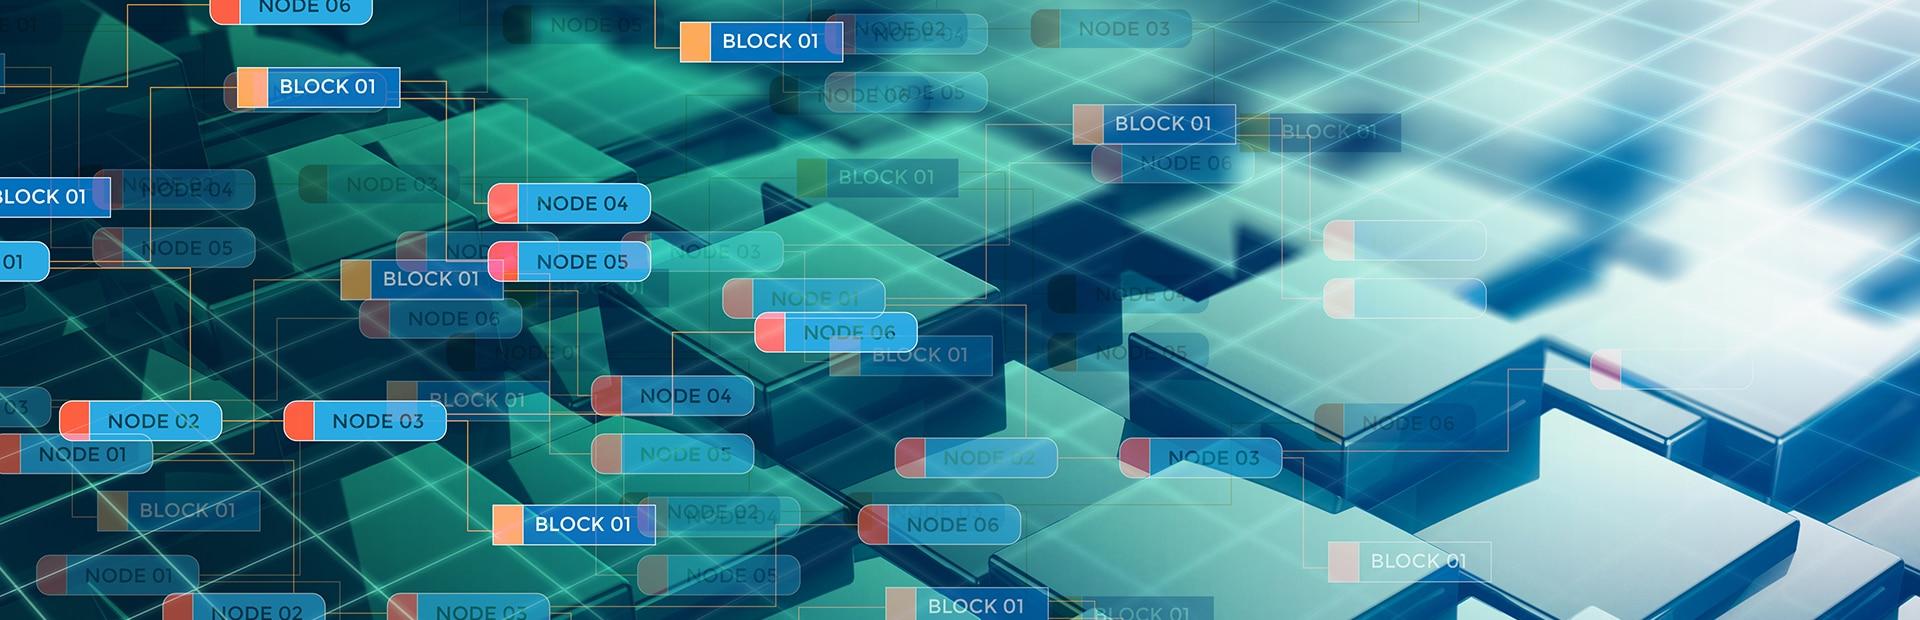 Blockchain Technology Nodes